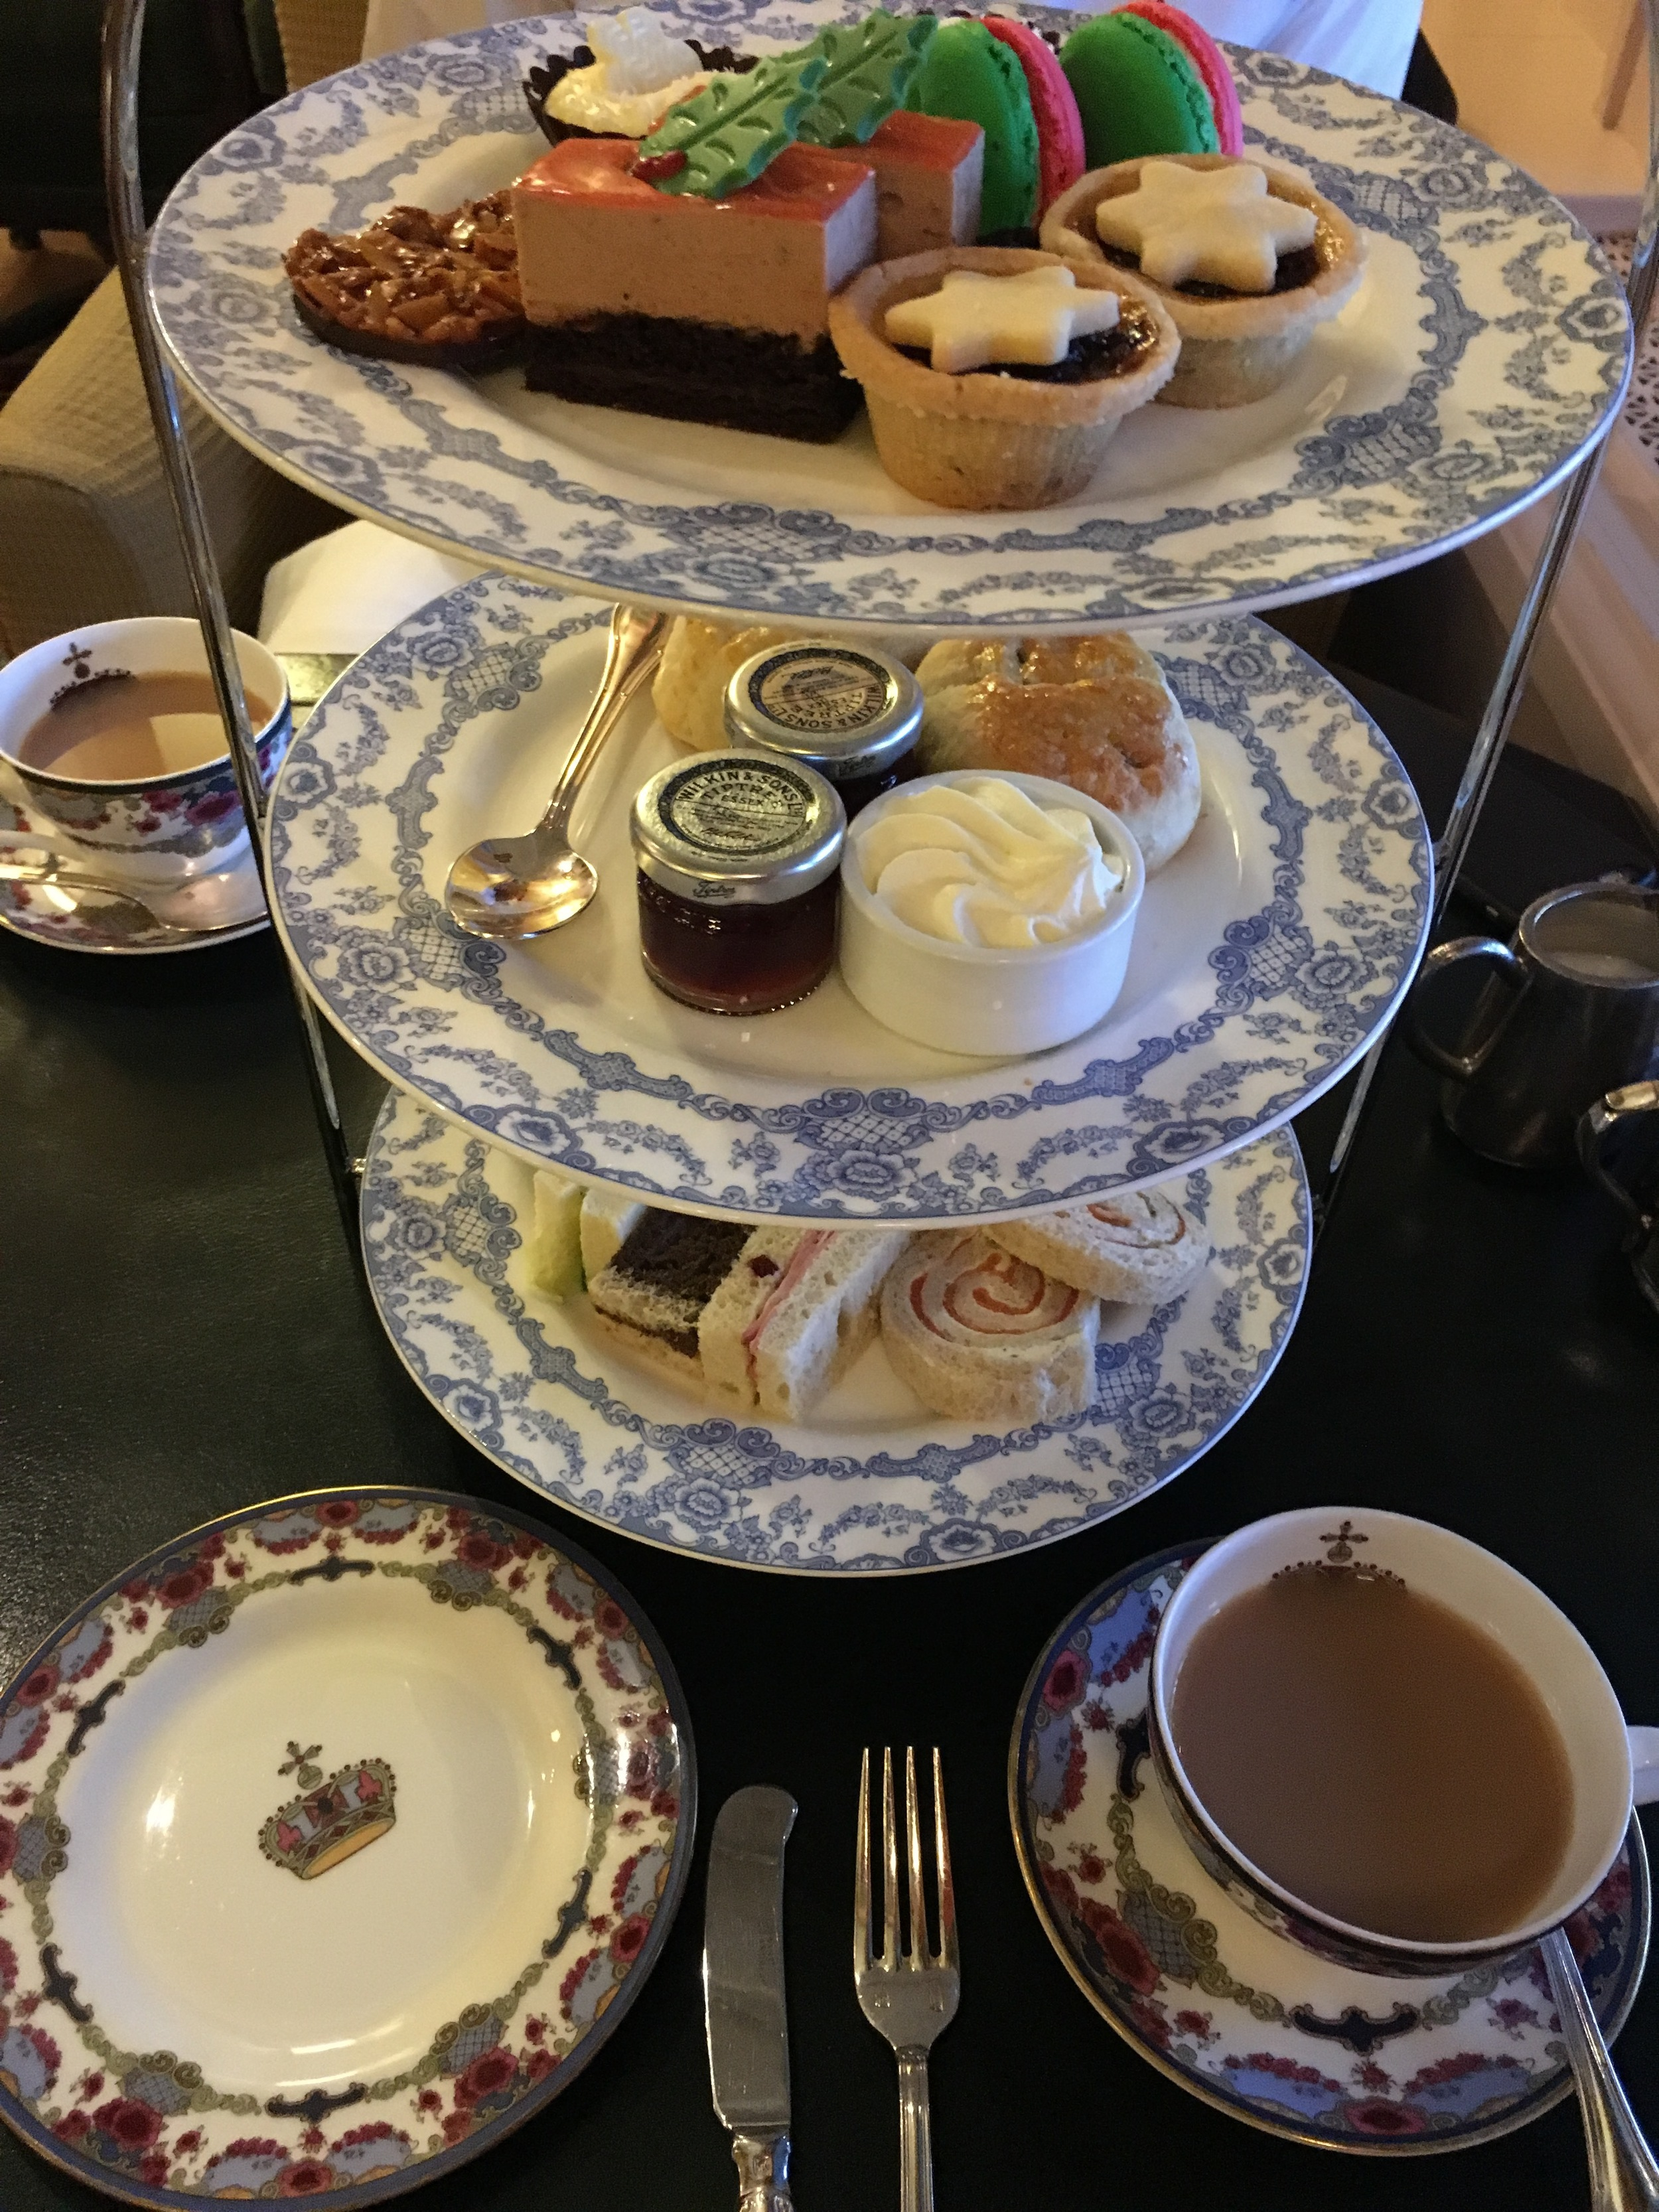 The goods alongside the Empress Blend tea